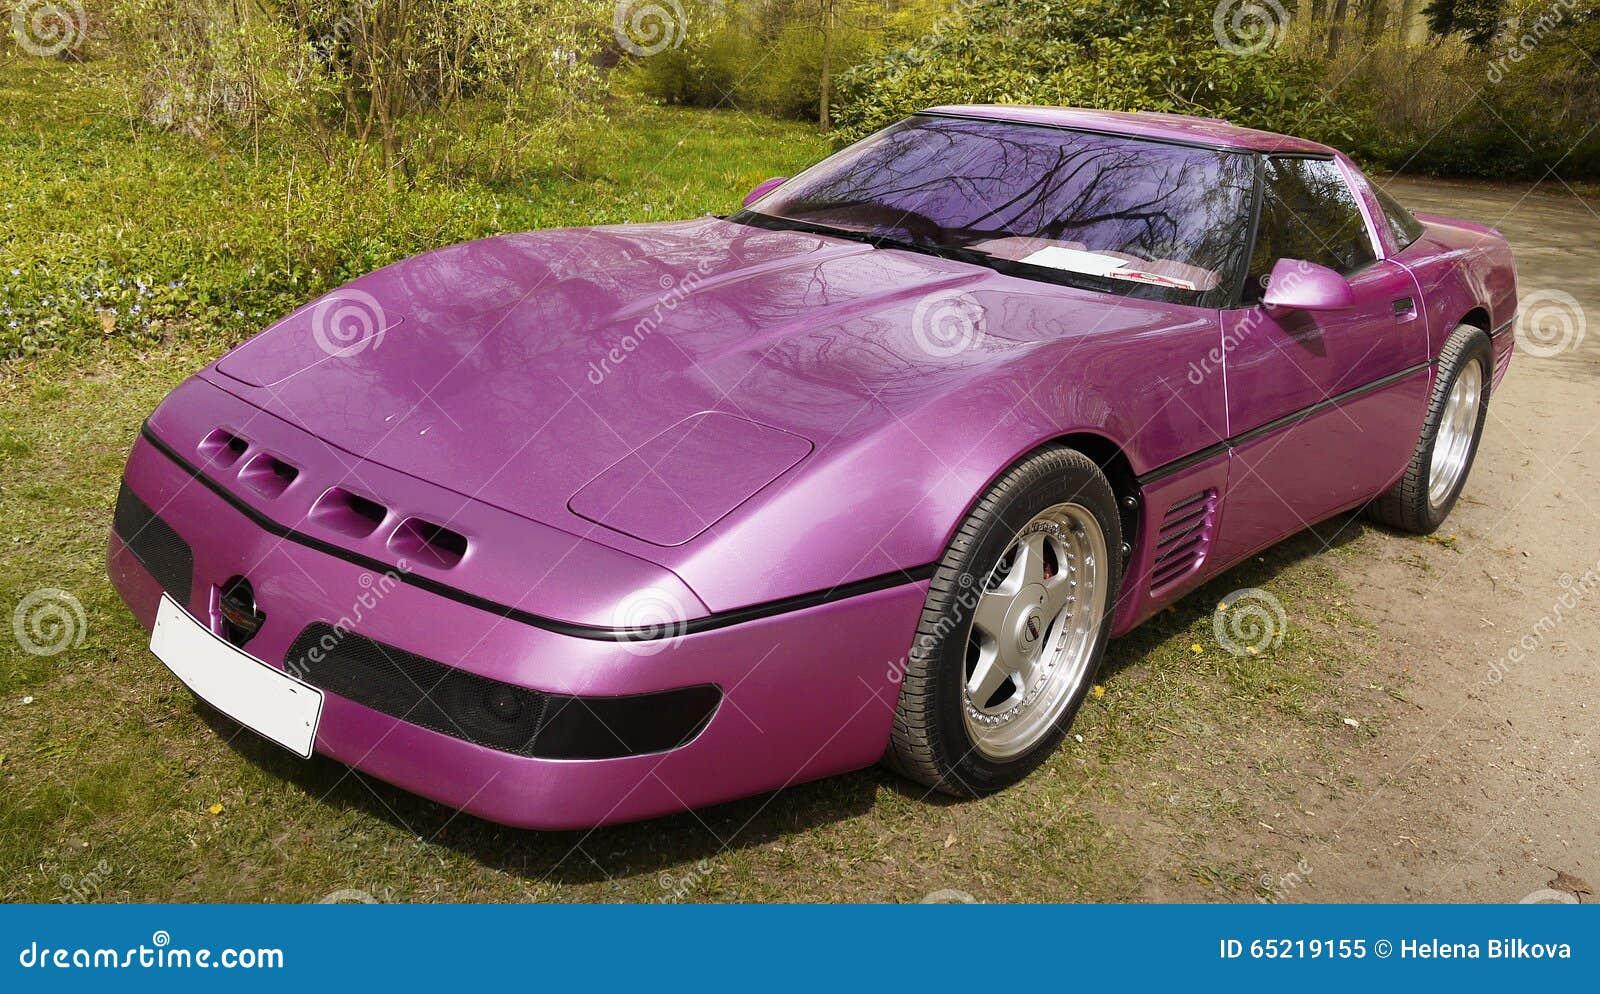 Chevrolet Of Helena >> Voiture De Sport Chevrolet Corvette Image éditorial ...